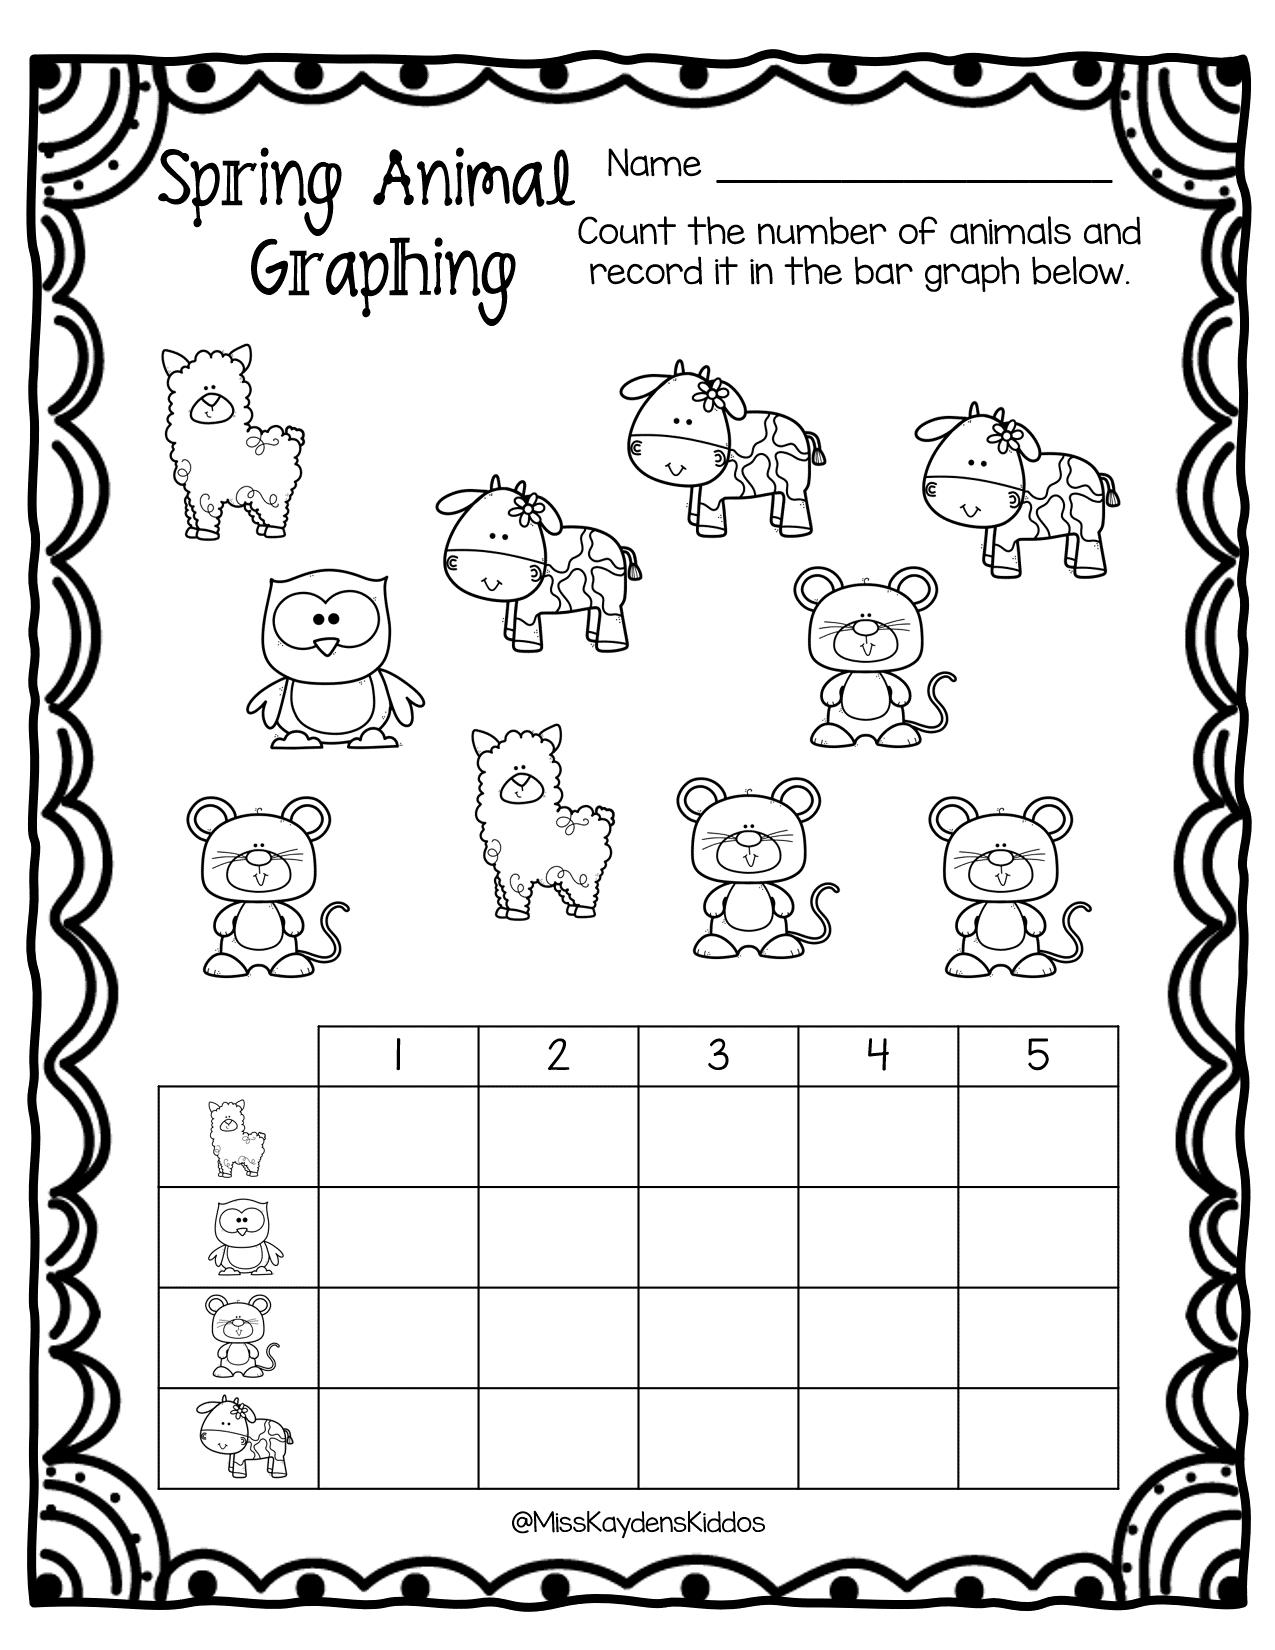 Printable Spring Animal Bar Graphing Worksheets Kids Data Etsy In 2021 Graphing Worksheets Math Worksheets Sight Word Flashcards [ 1650 x 1275 Pixel ]